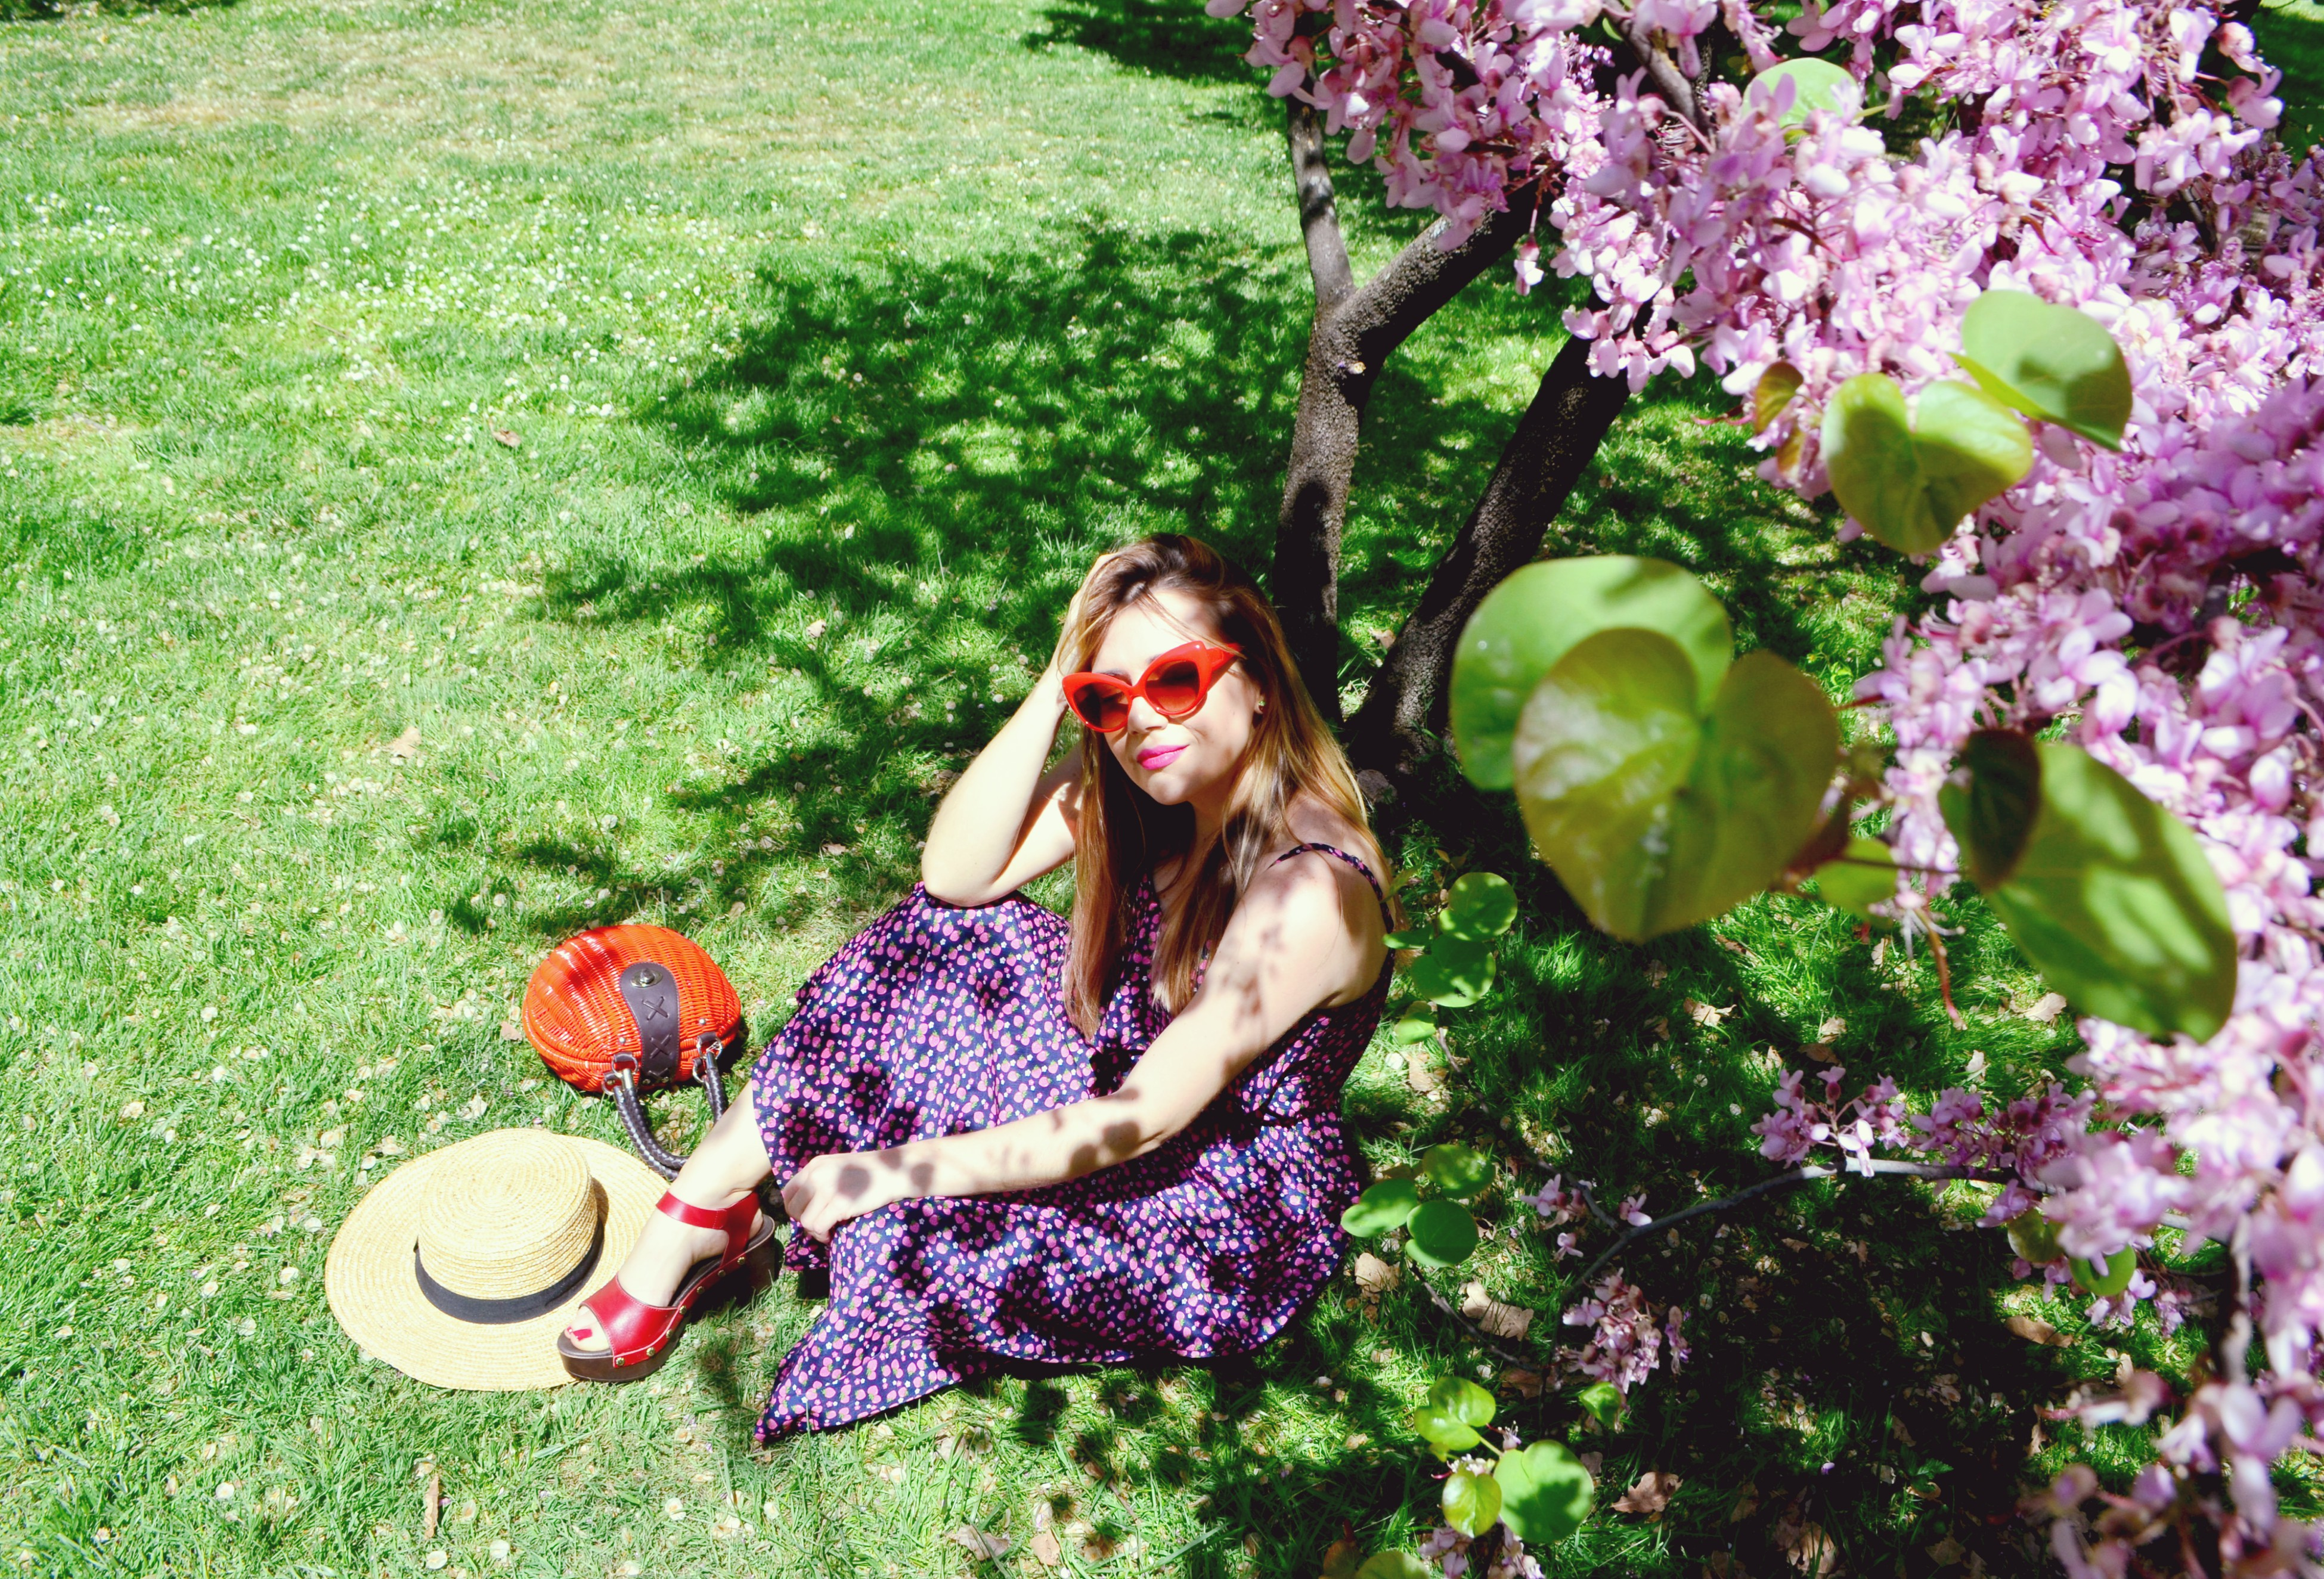 Trakabarraka-spring-dress-vestido-de-fresas-ChicAdicta-influencer-Madrid-Chic-Adicta-fashionista-sandalias-rojas-PiensaenChic-Piensa-en-Chic